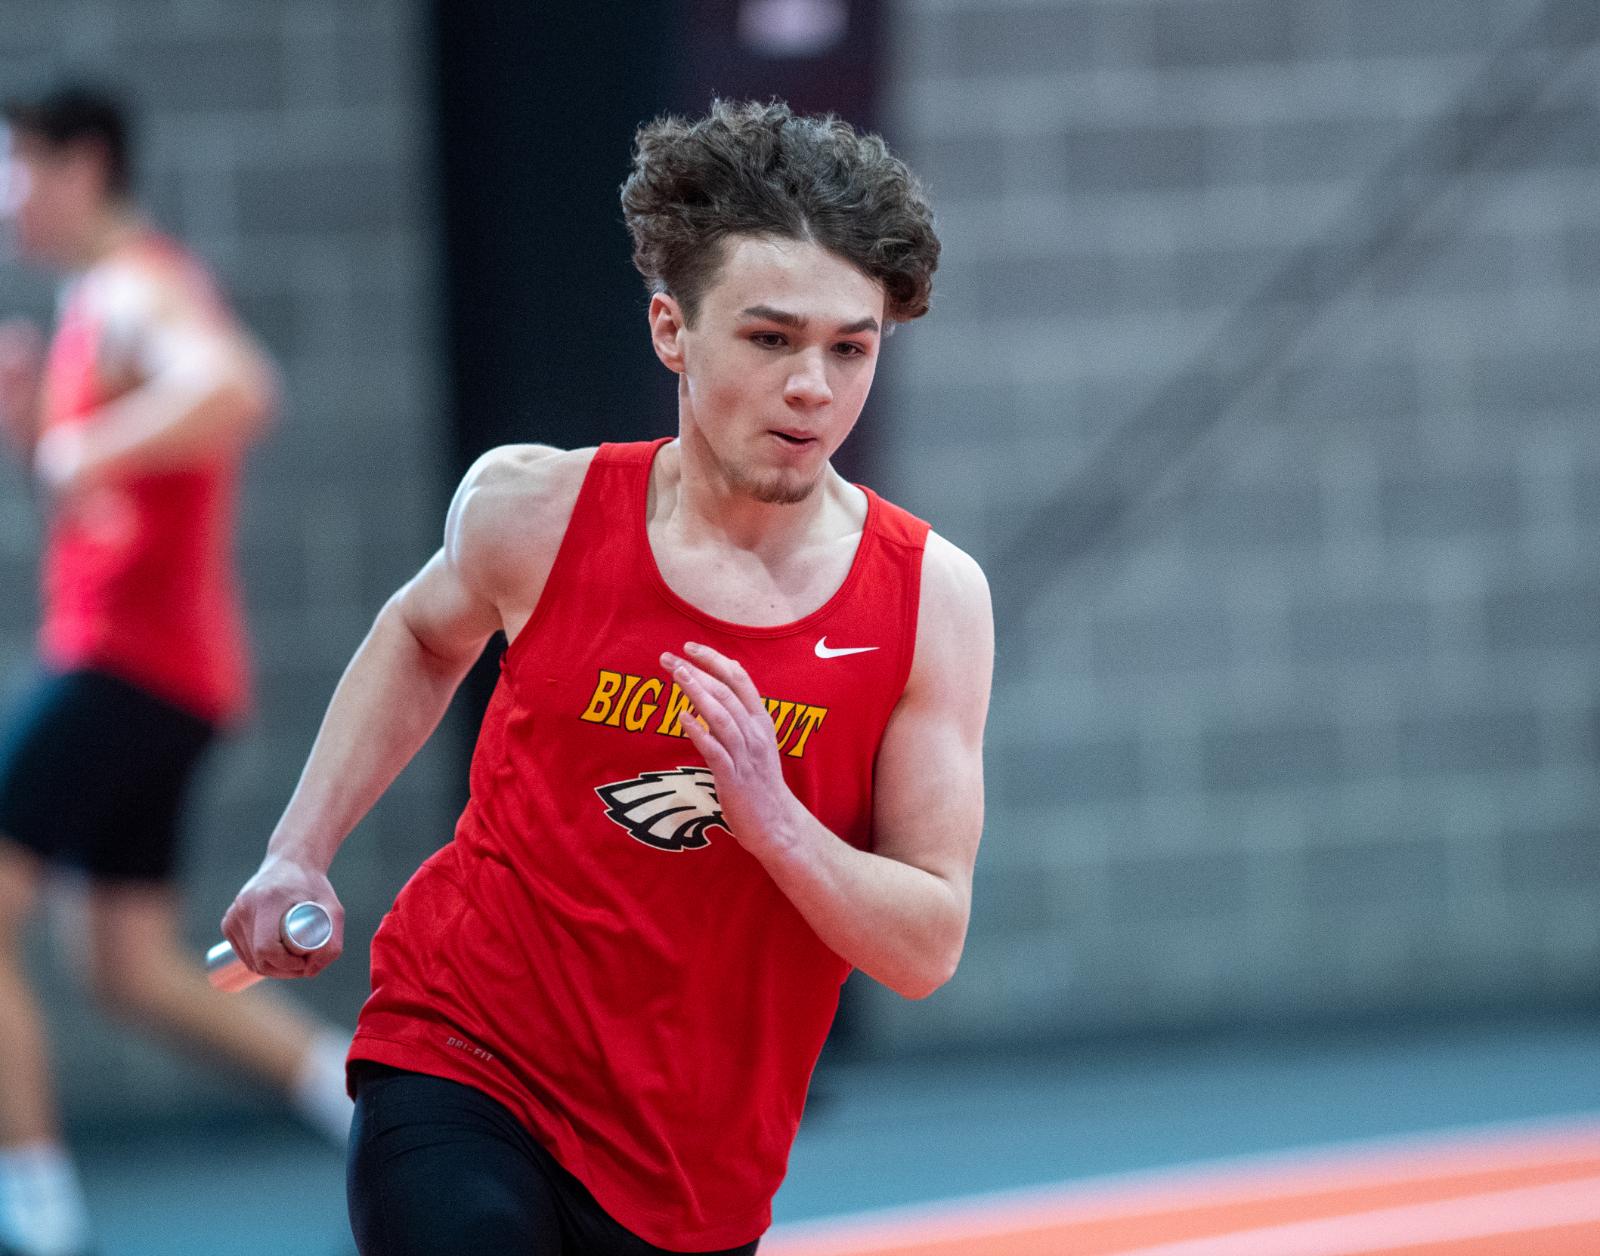 PHOTO GALLERY: Big Walnut track teams compete in Mount Vernon